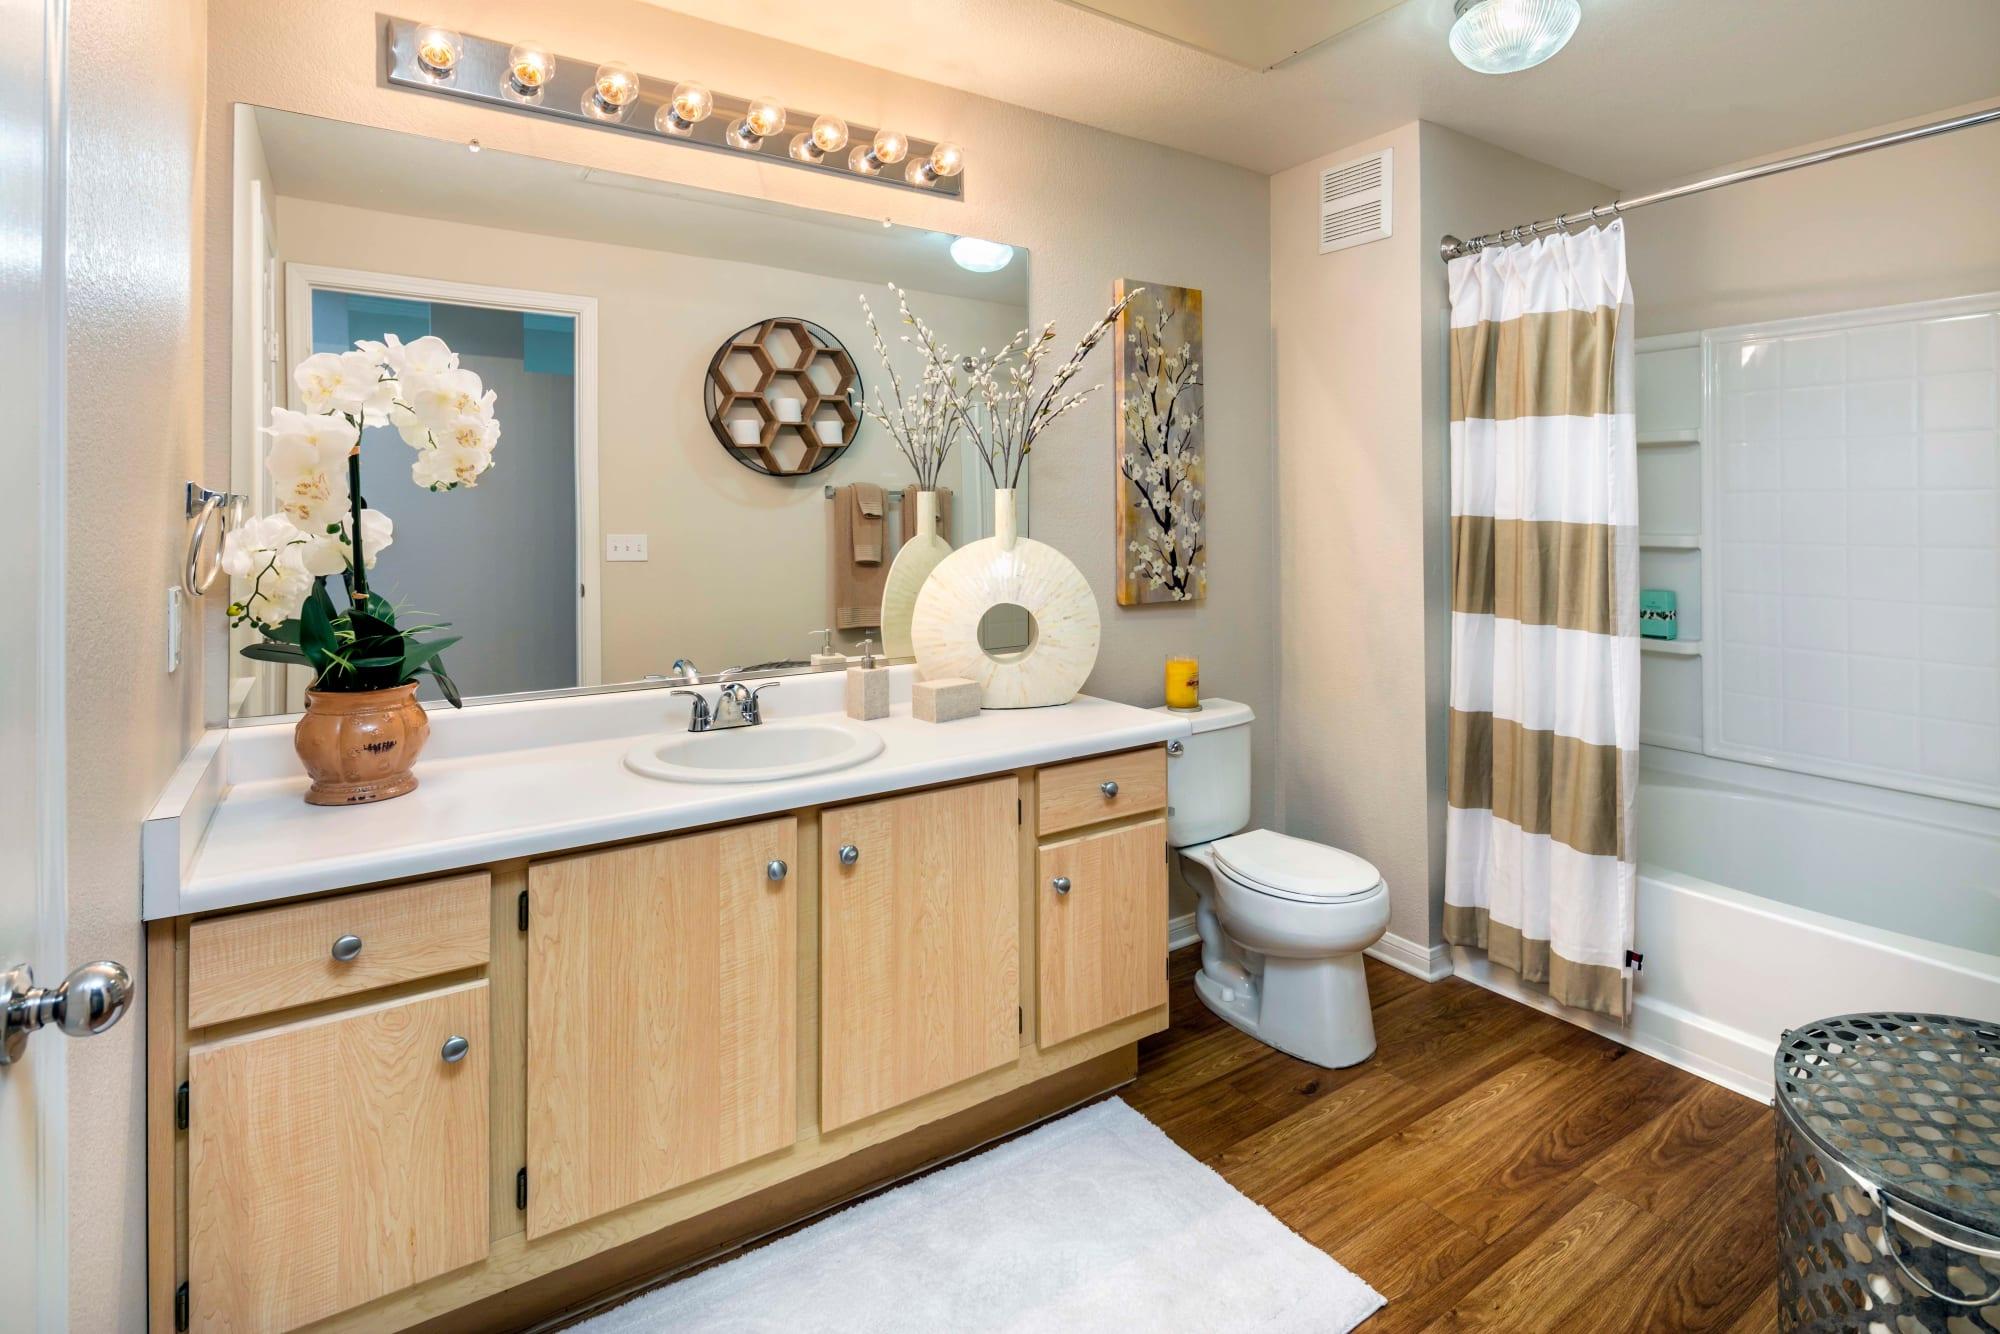 A well decorated bathroom at Miramonte and Trovas in Sacramento, California